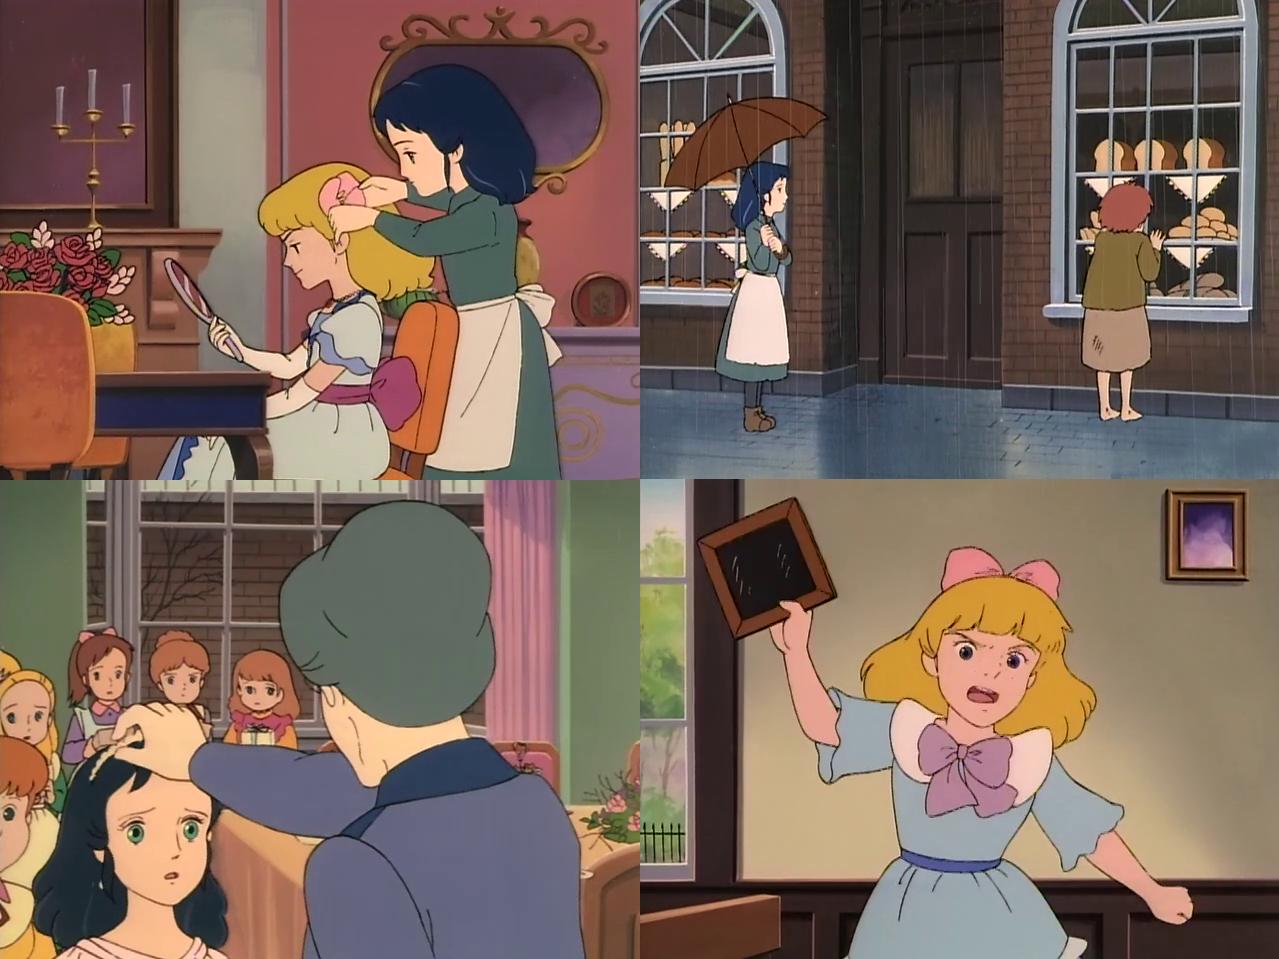 princesse sarah | sally | Old anime, Childhood memories ...